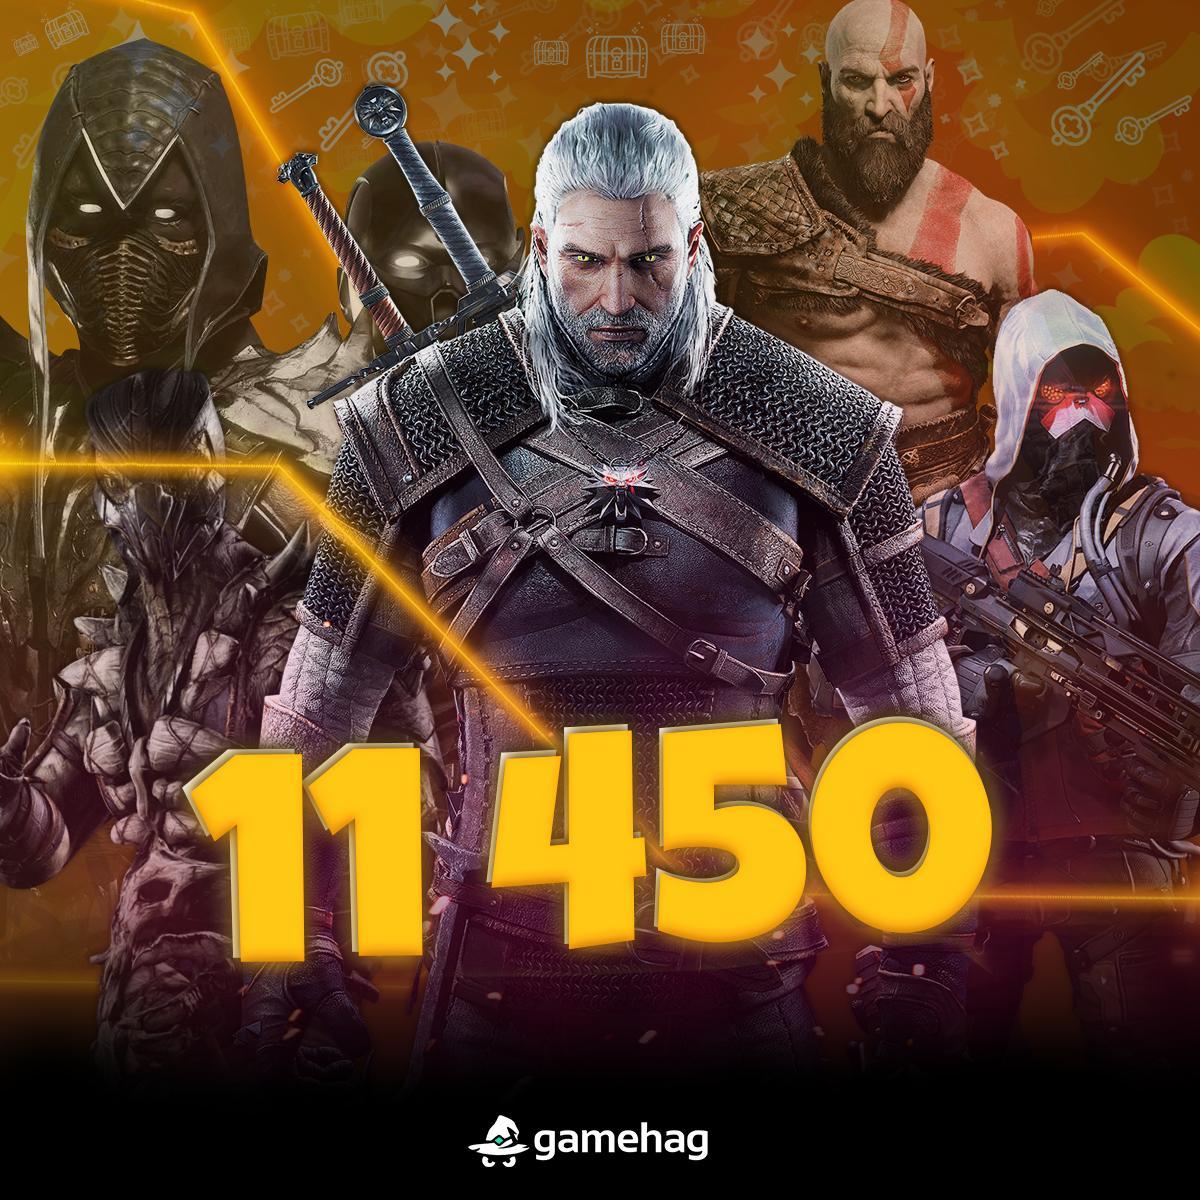 Gamehag (@GamehagOfficial) | Twitter